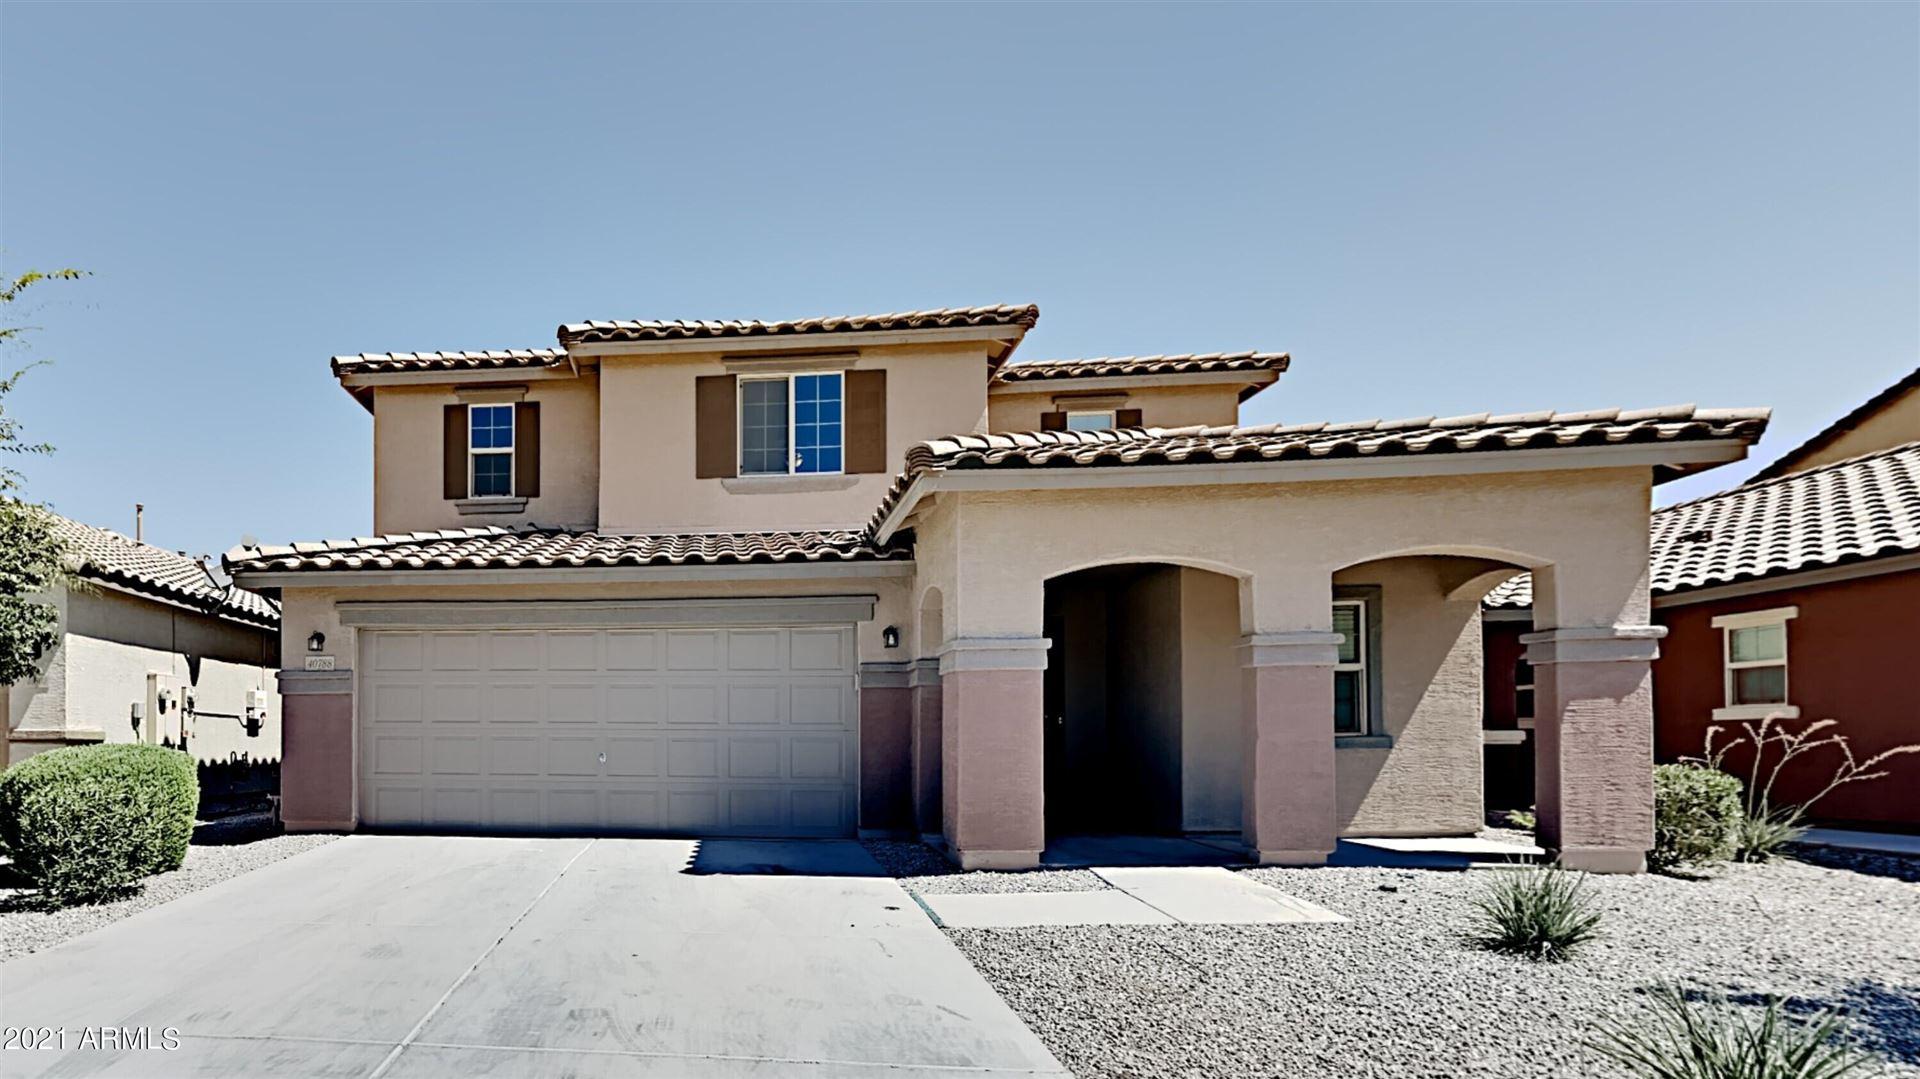 40788 W PORTIS Drive, Maricopa, AZ 85138 - MLS#: 6254606